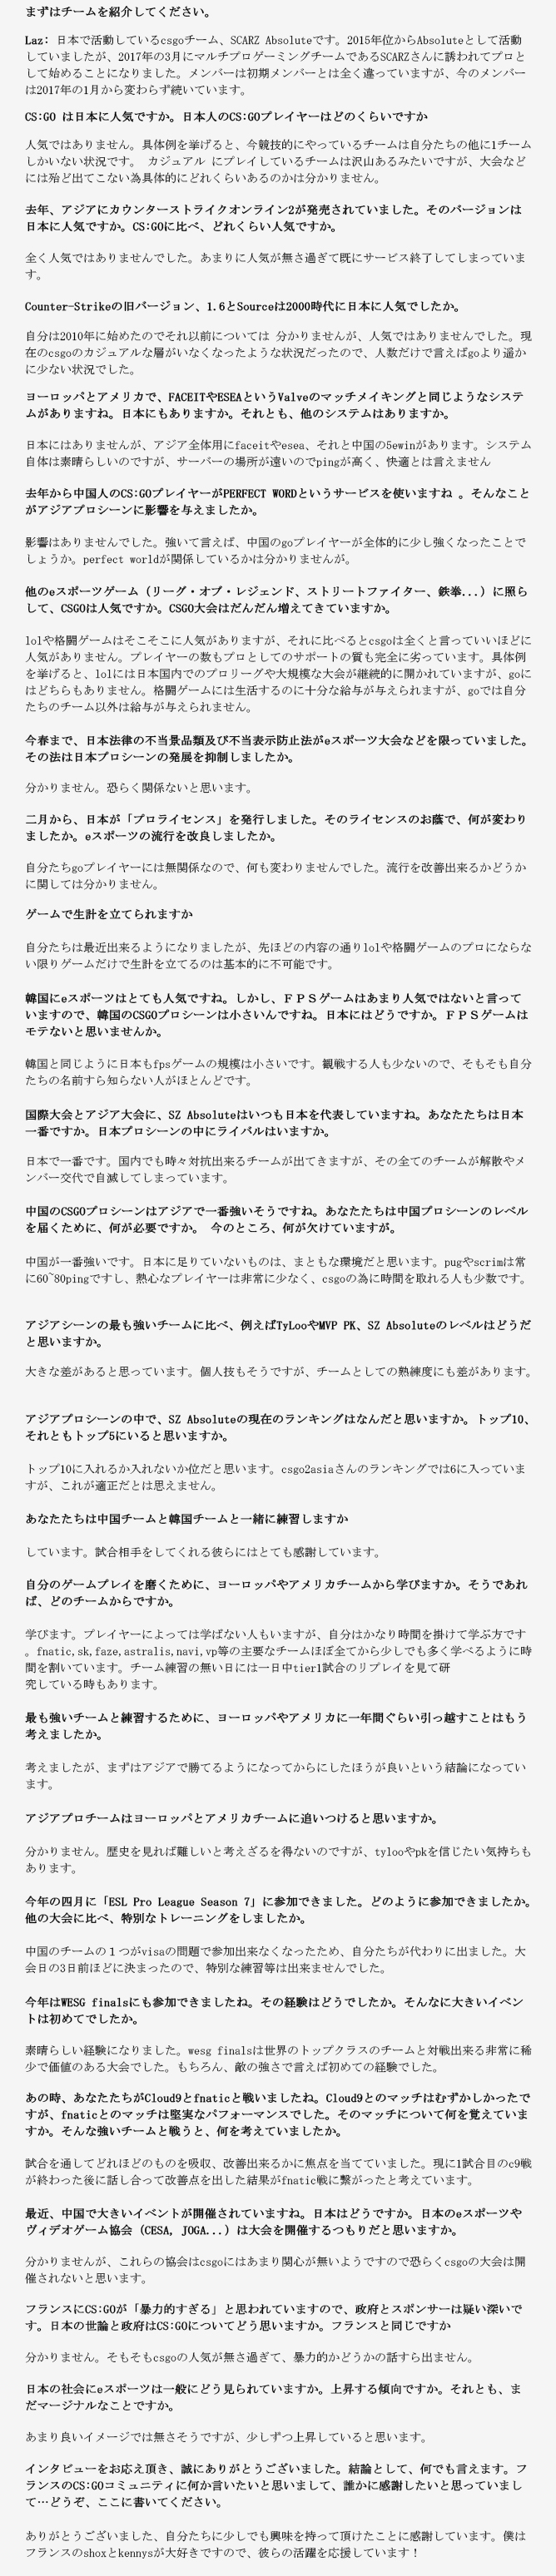 laz-interview-japanese